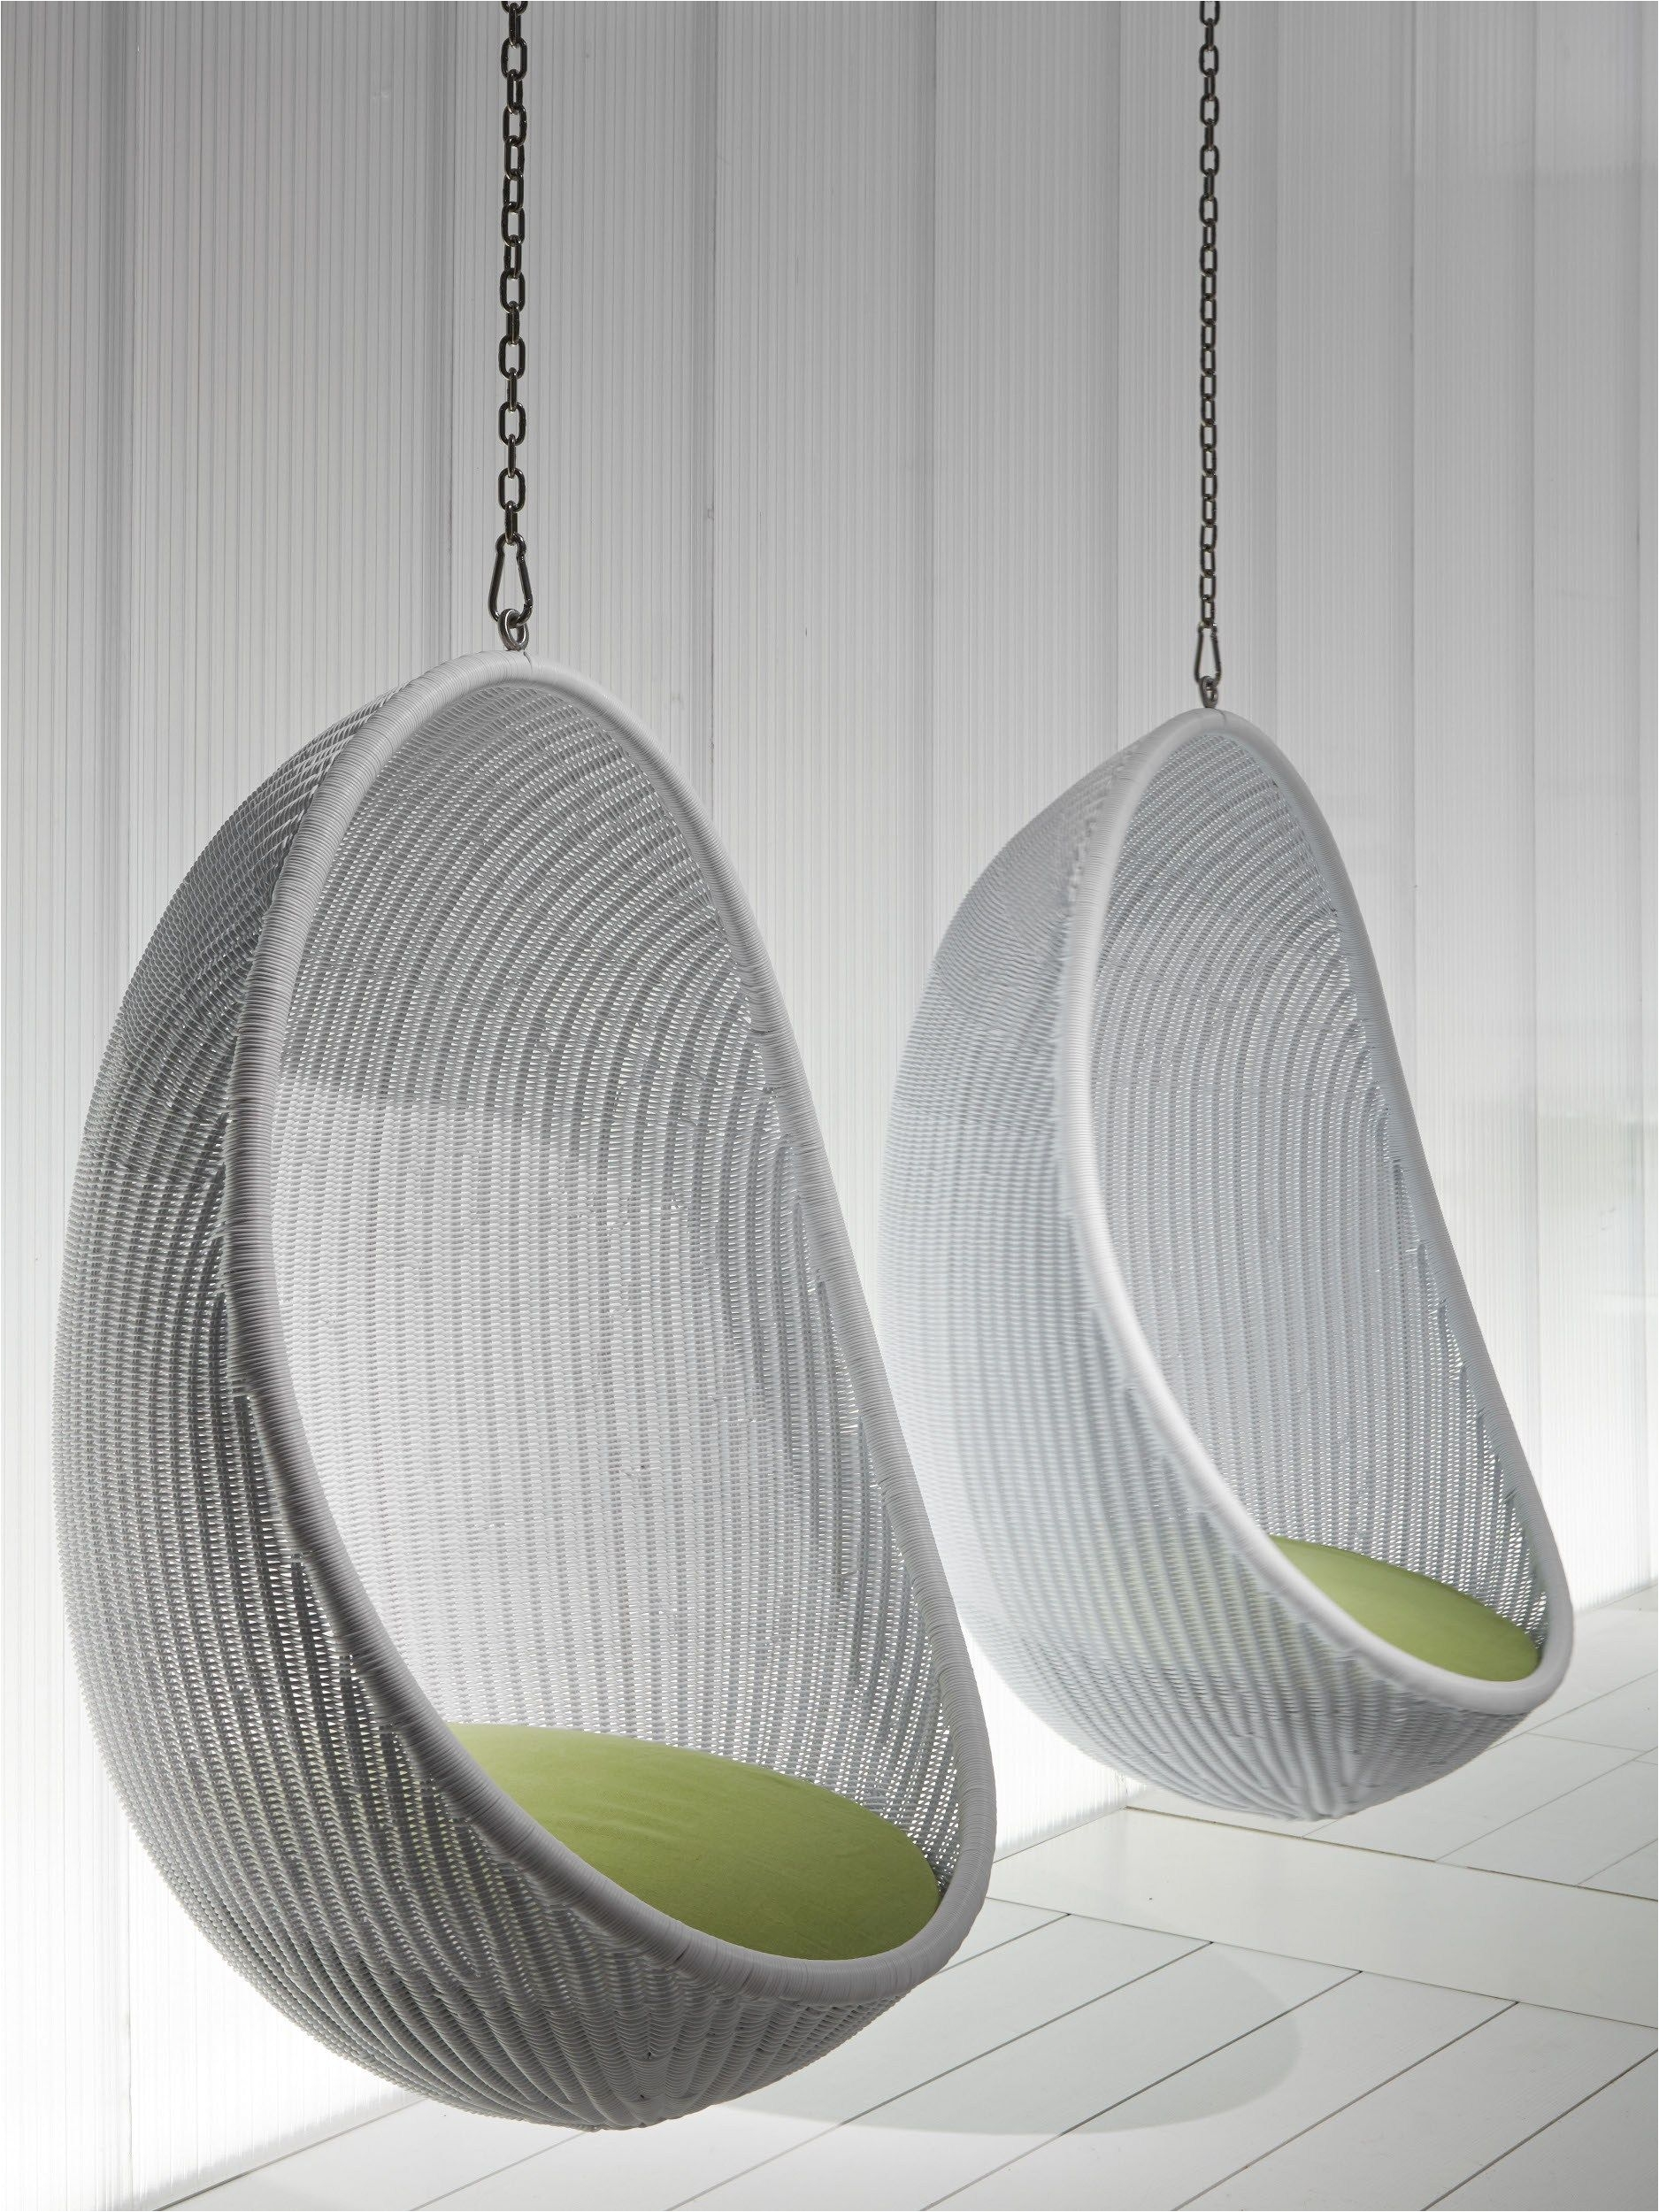 Teardrop Swing Chair Ikea Furniture Nice Looking White Woven Rattan Two Hanging Egg